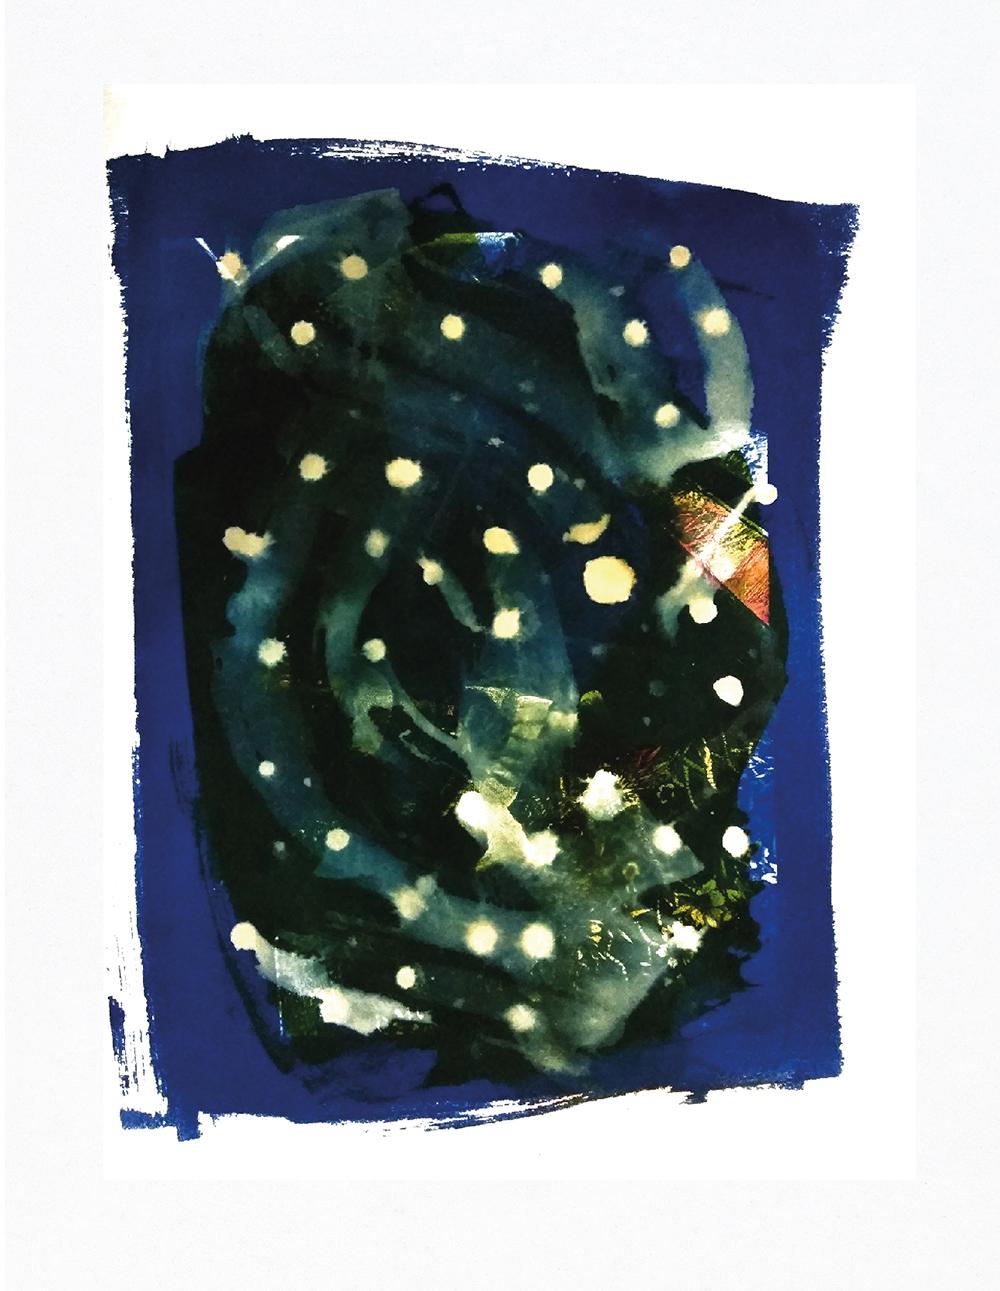 Inventario de Sombras Azules